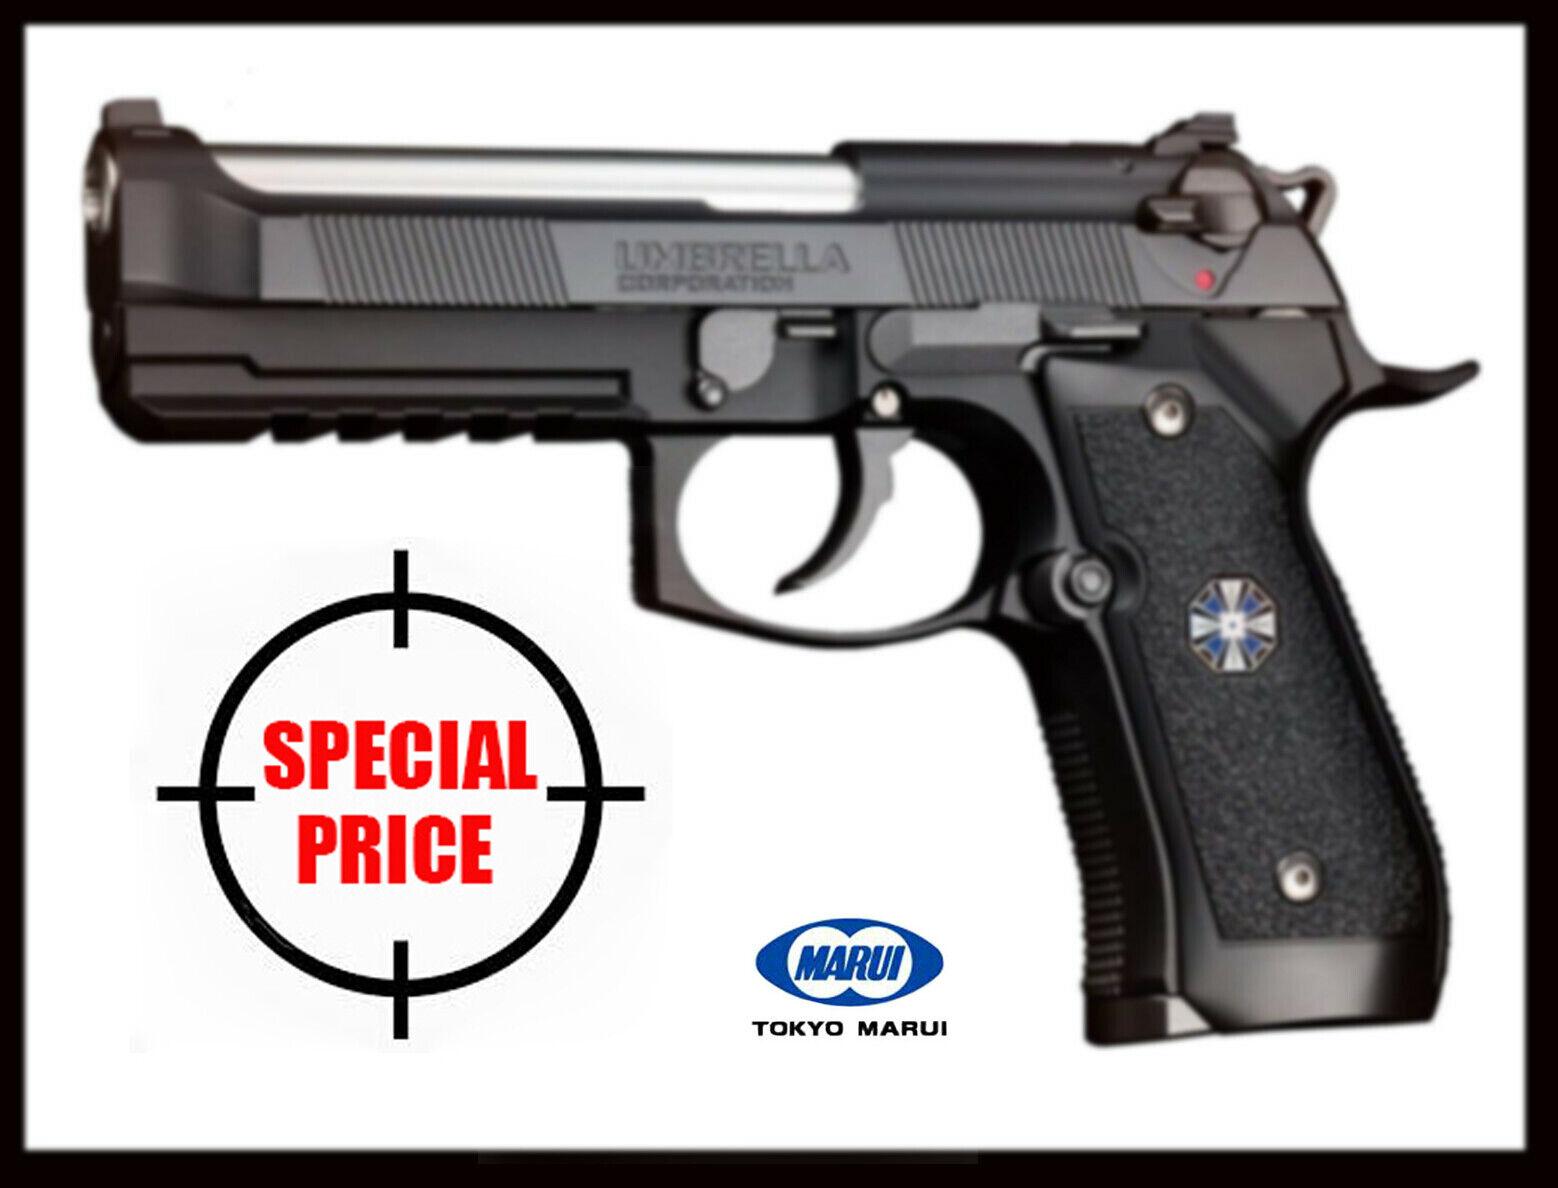 AIR SOFT GUN Biohazard Albert W Model 01 Toy Hand Gun Tactical 18years JP F S